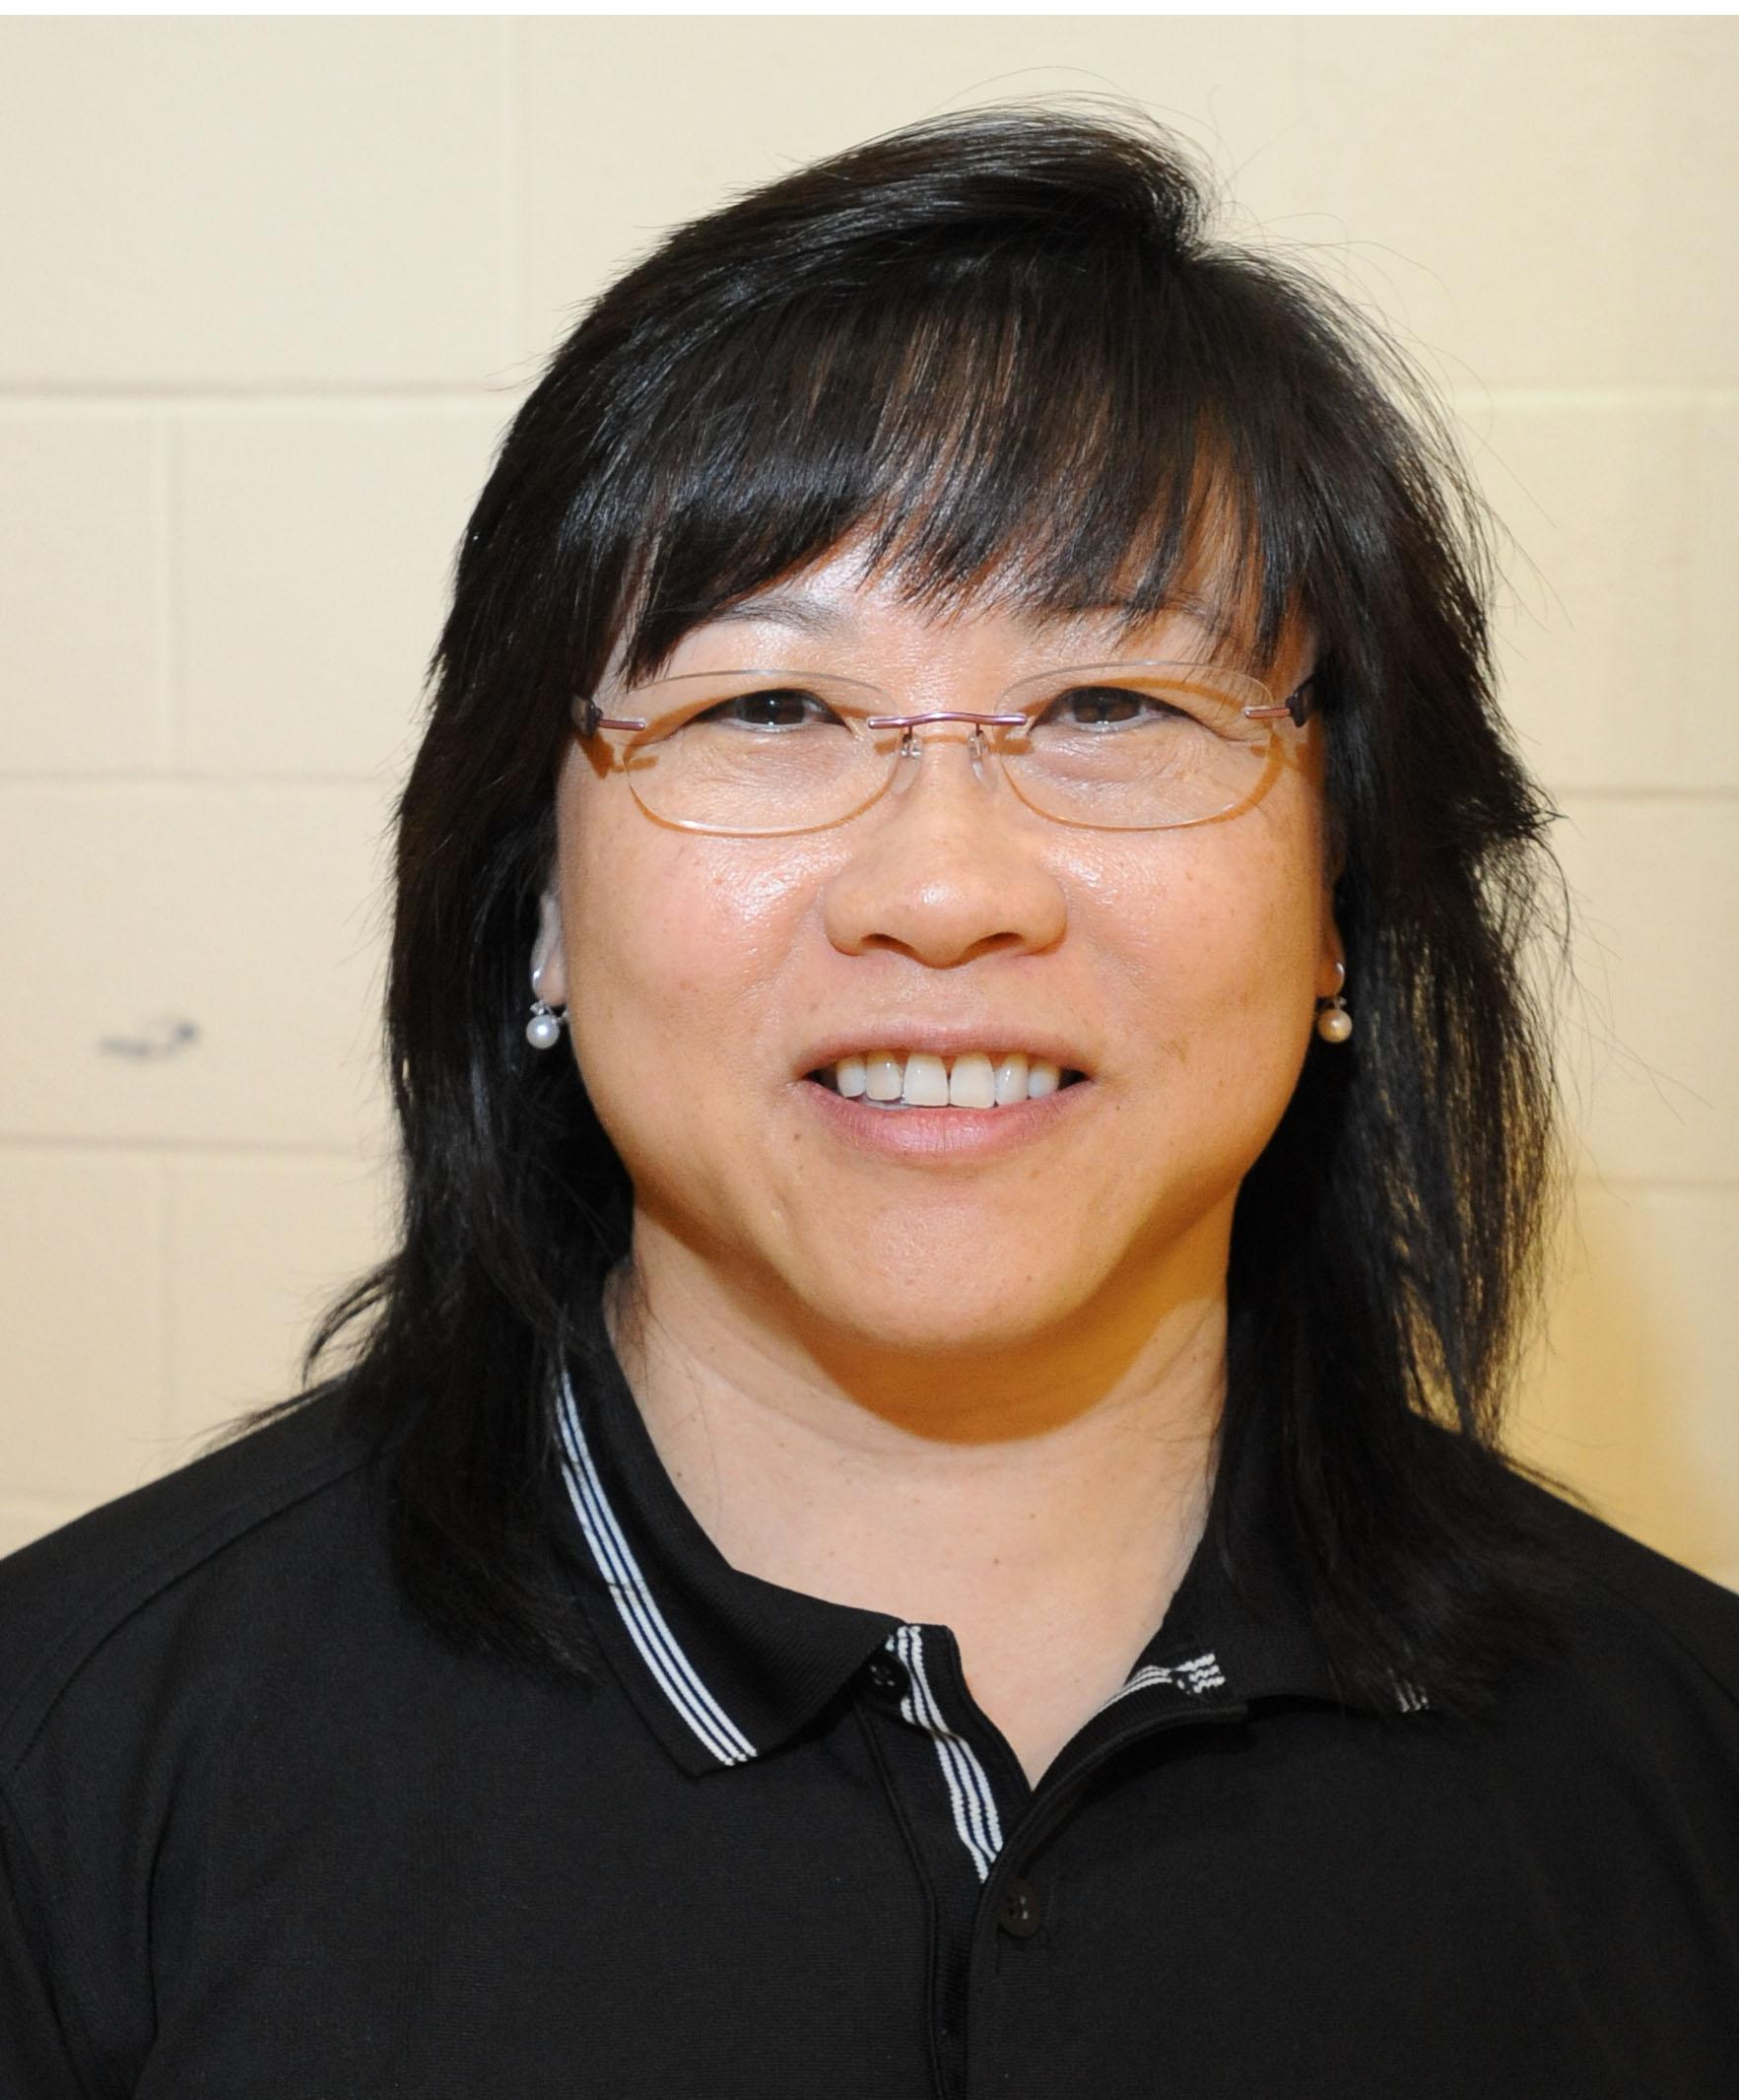 Advancement physical therapy - Judy Seto Pt Dpt Ocs Scs Cscs Mba Pes Ces